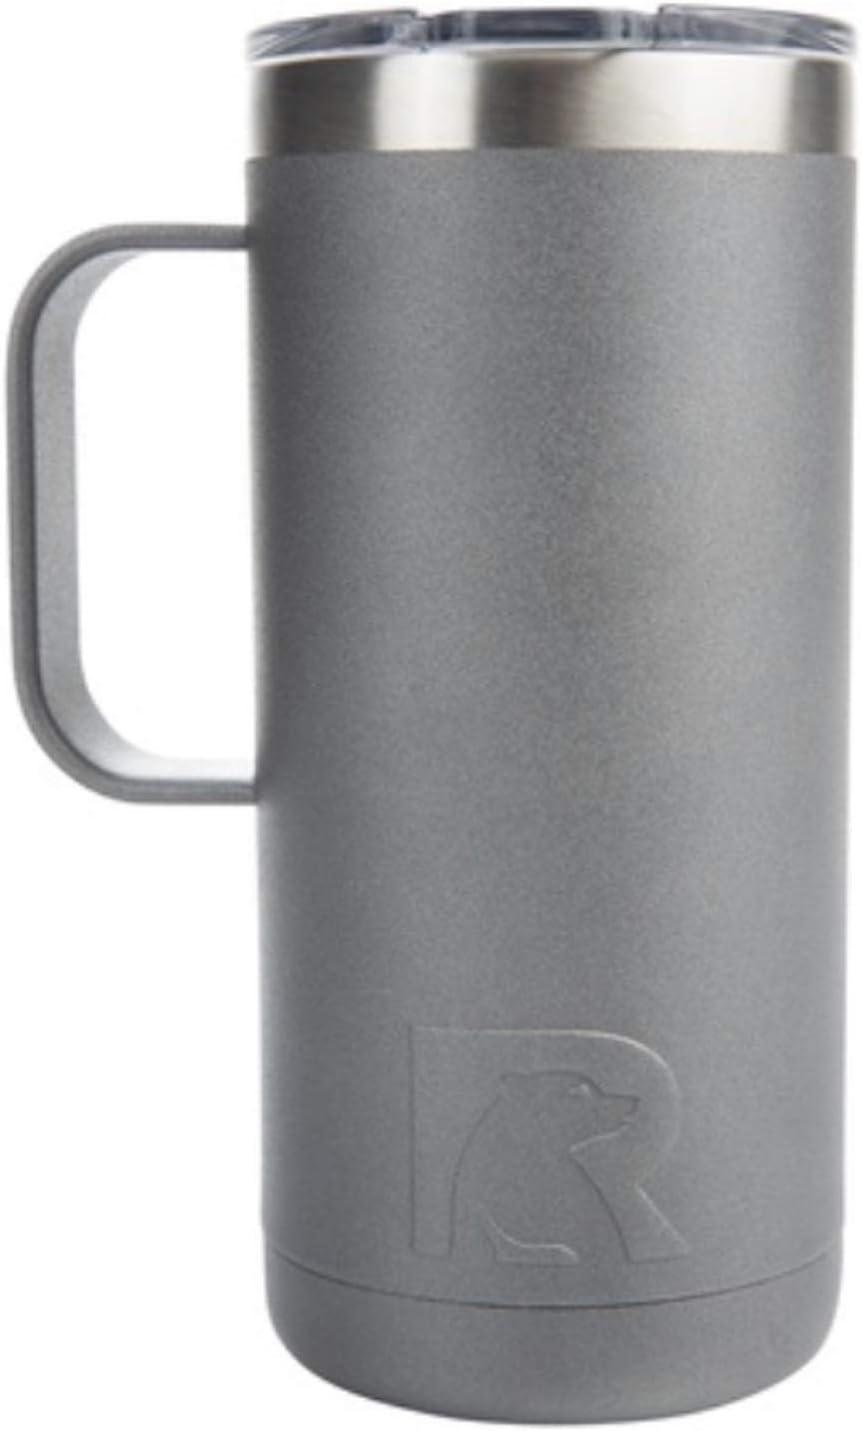 RTIC Travel Coffee Cup (16 oz), Graphite